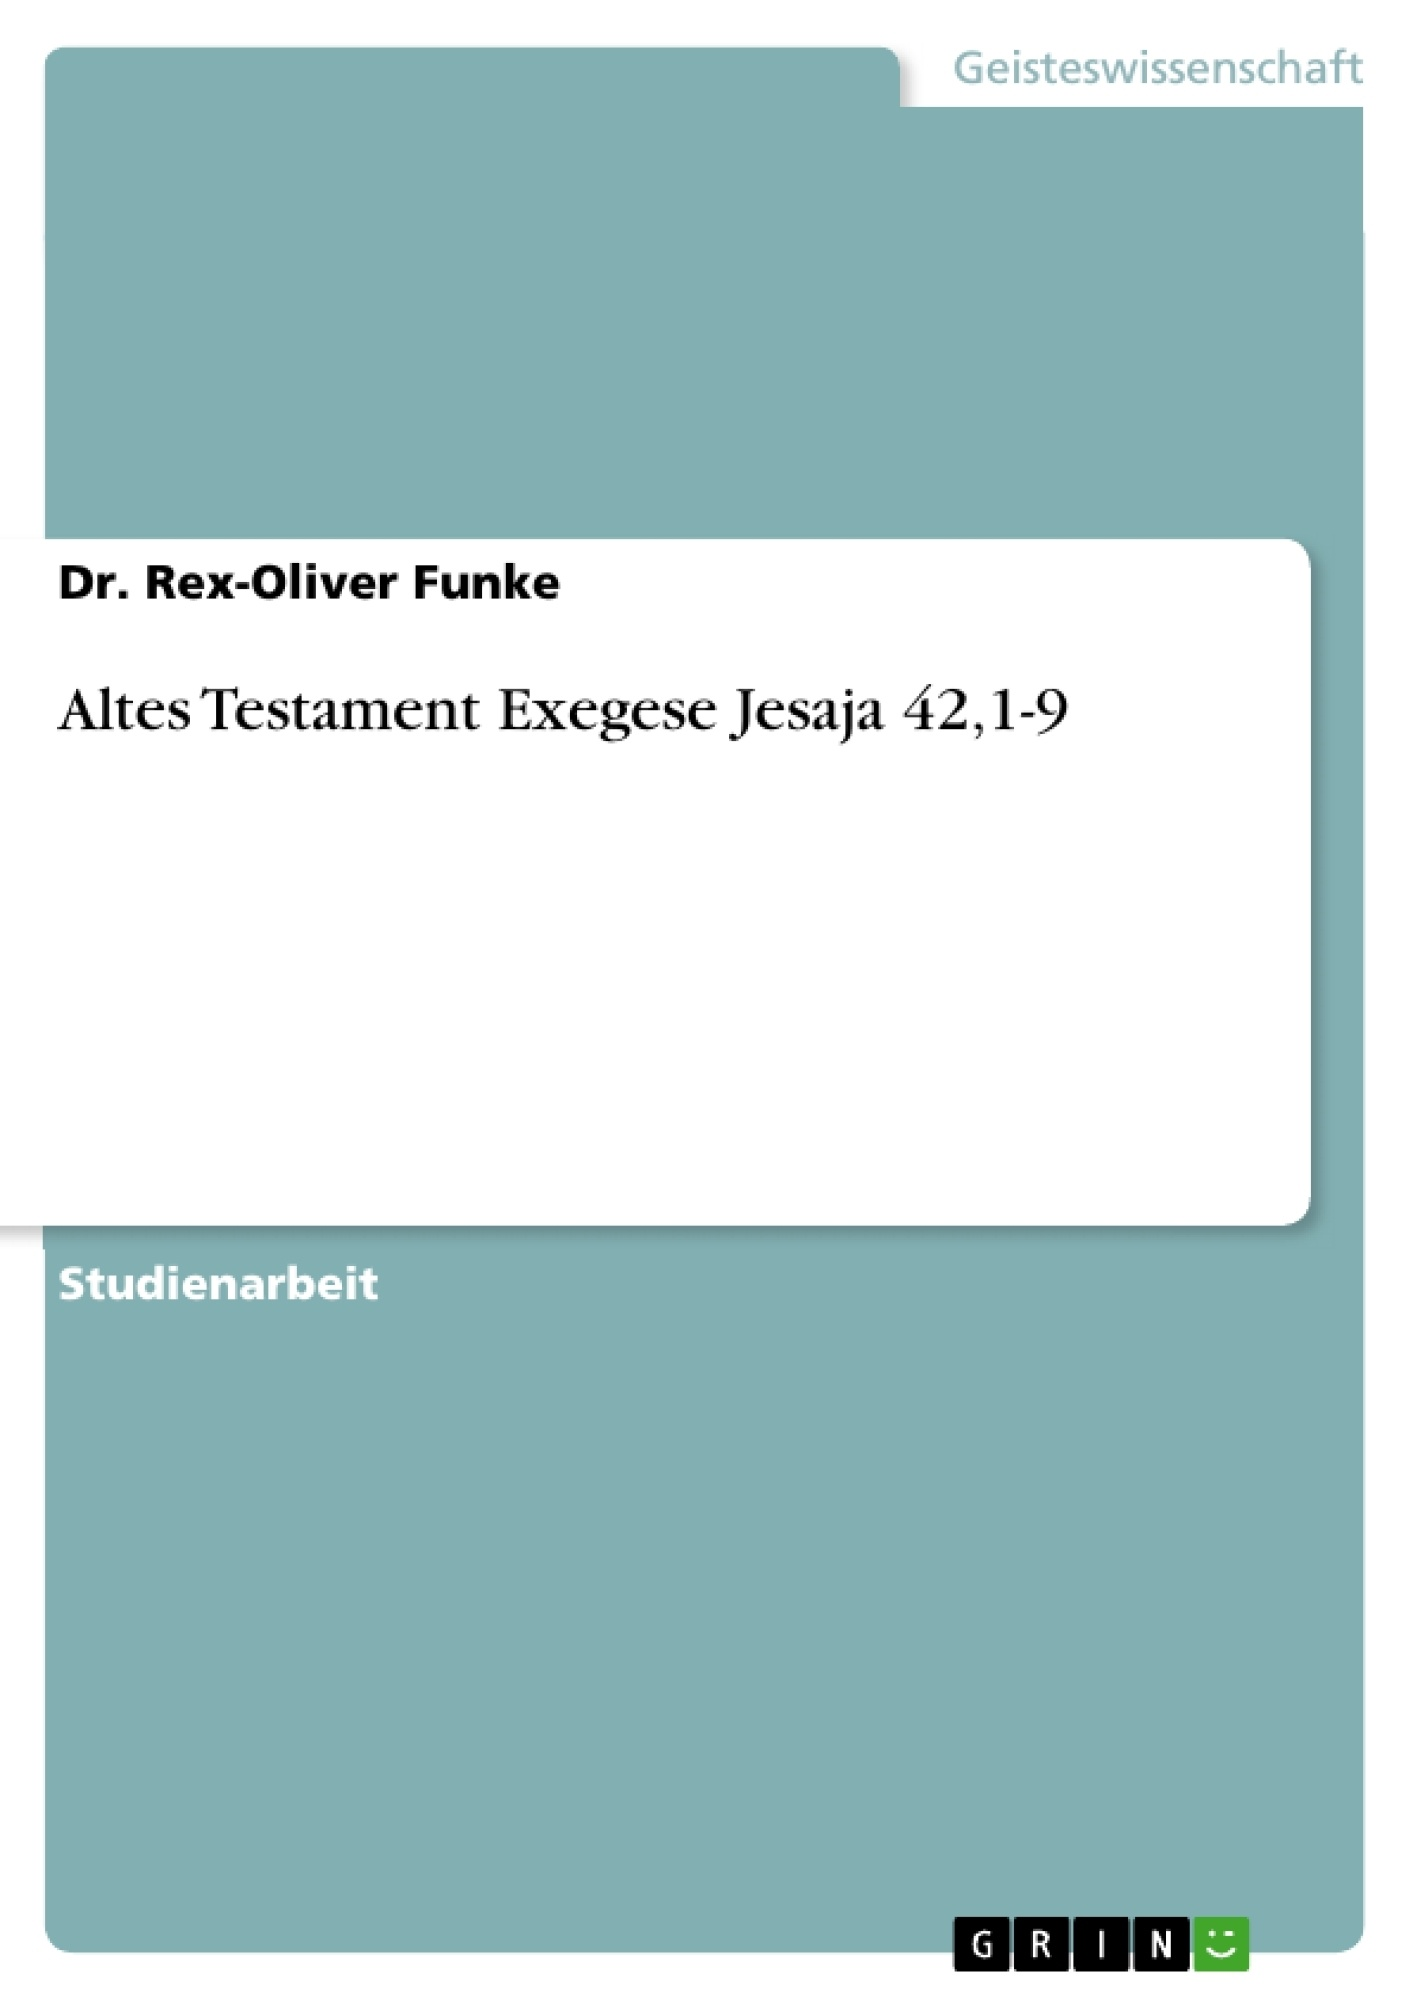 Titel: Altes Testament Exegese Jesaja 42,1-9